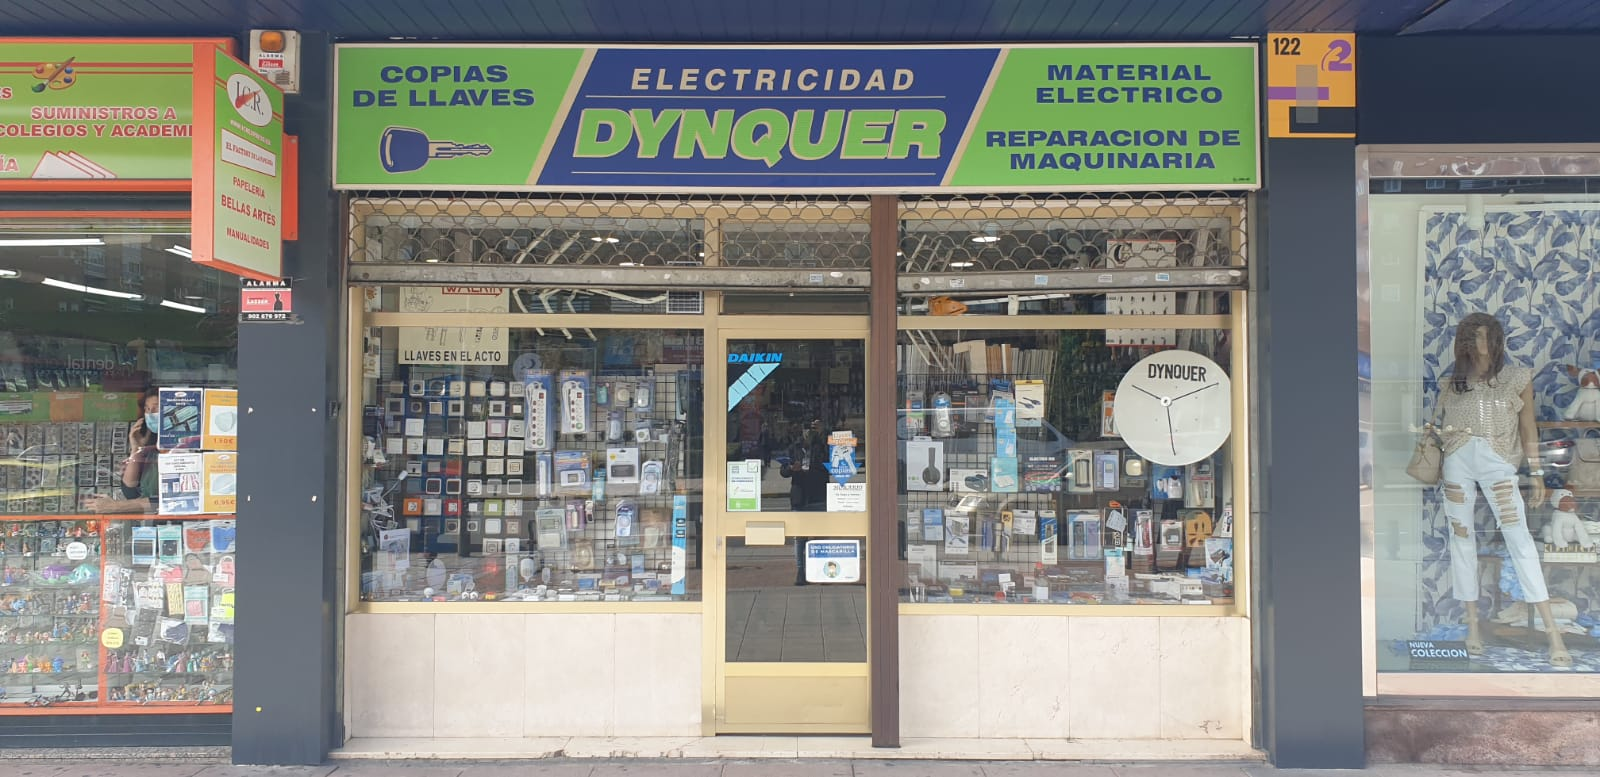 Electrónica Dynquer